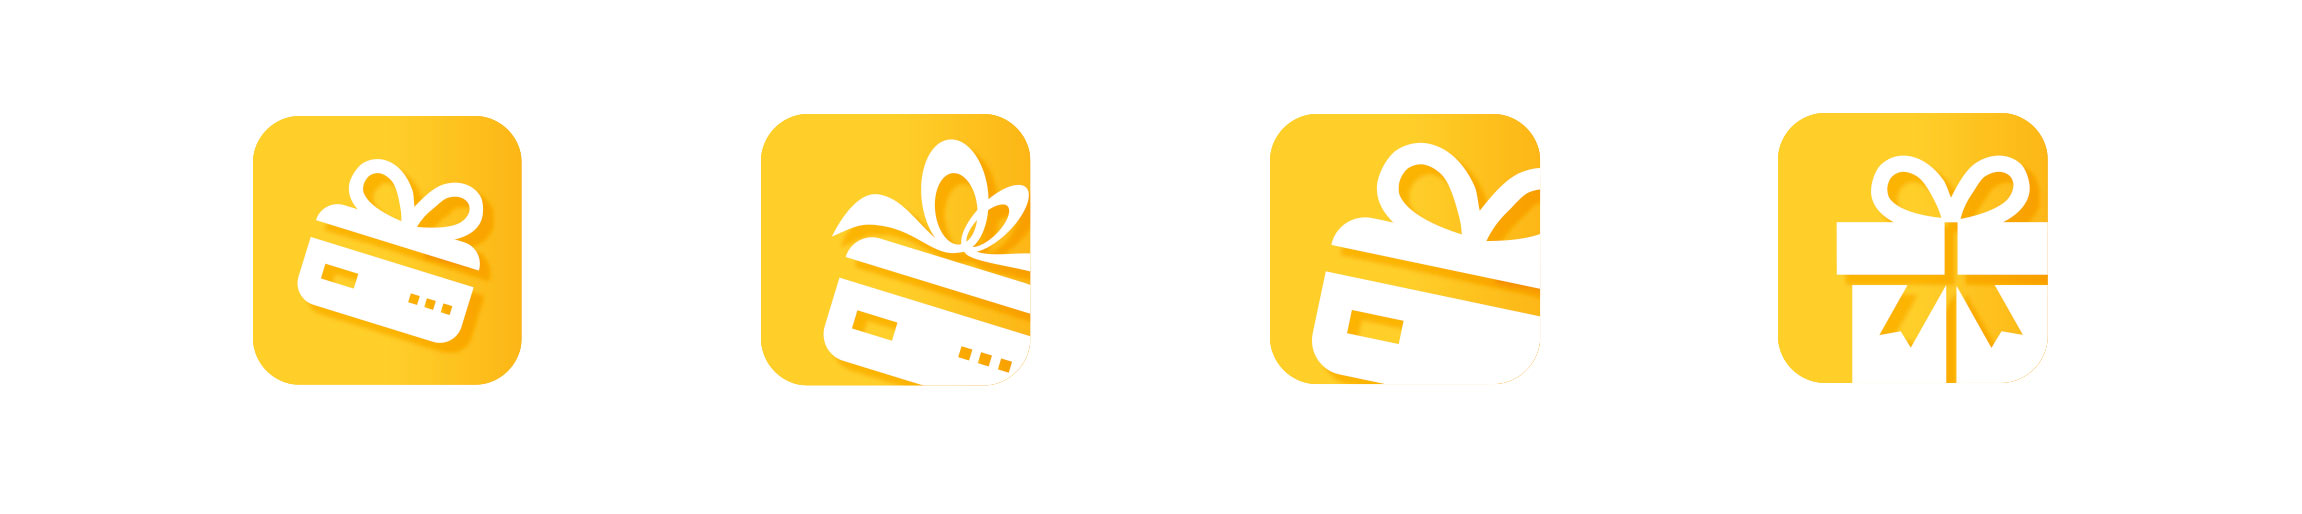 http://xiaoqiongji.com/wp-content/uploads/2019/09/app-logo.jpg